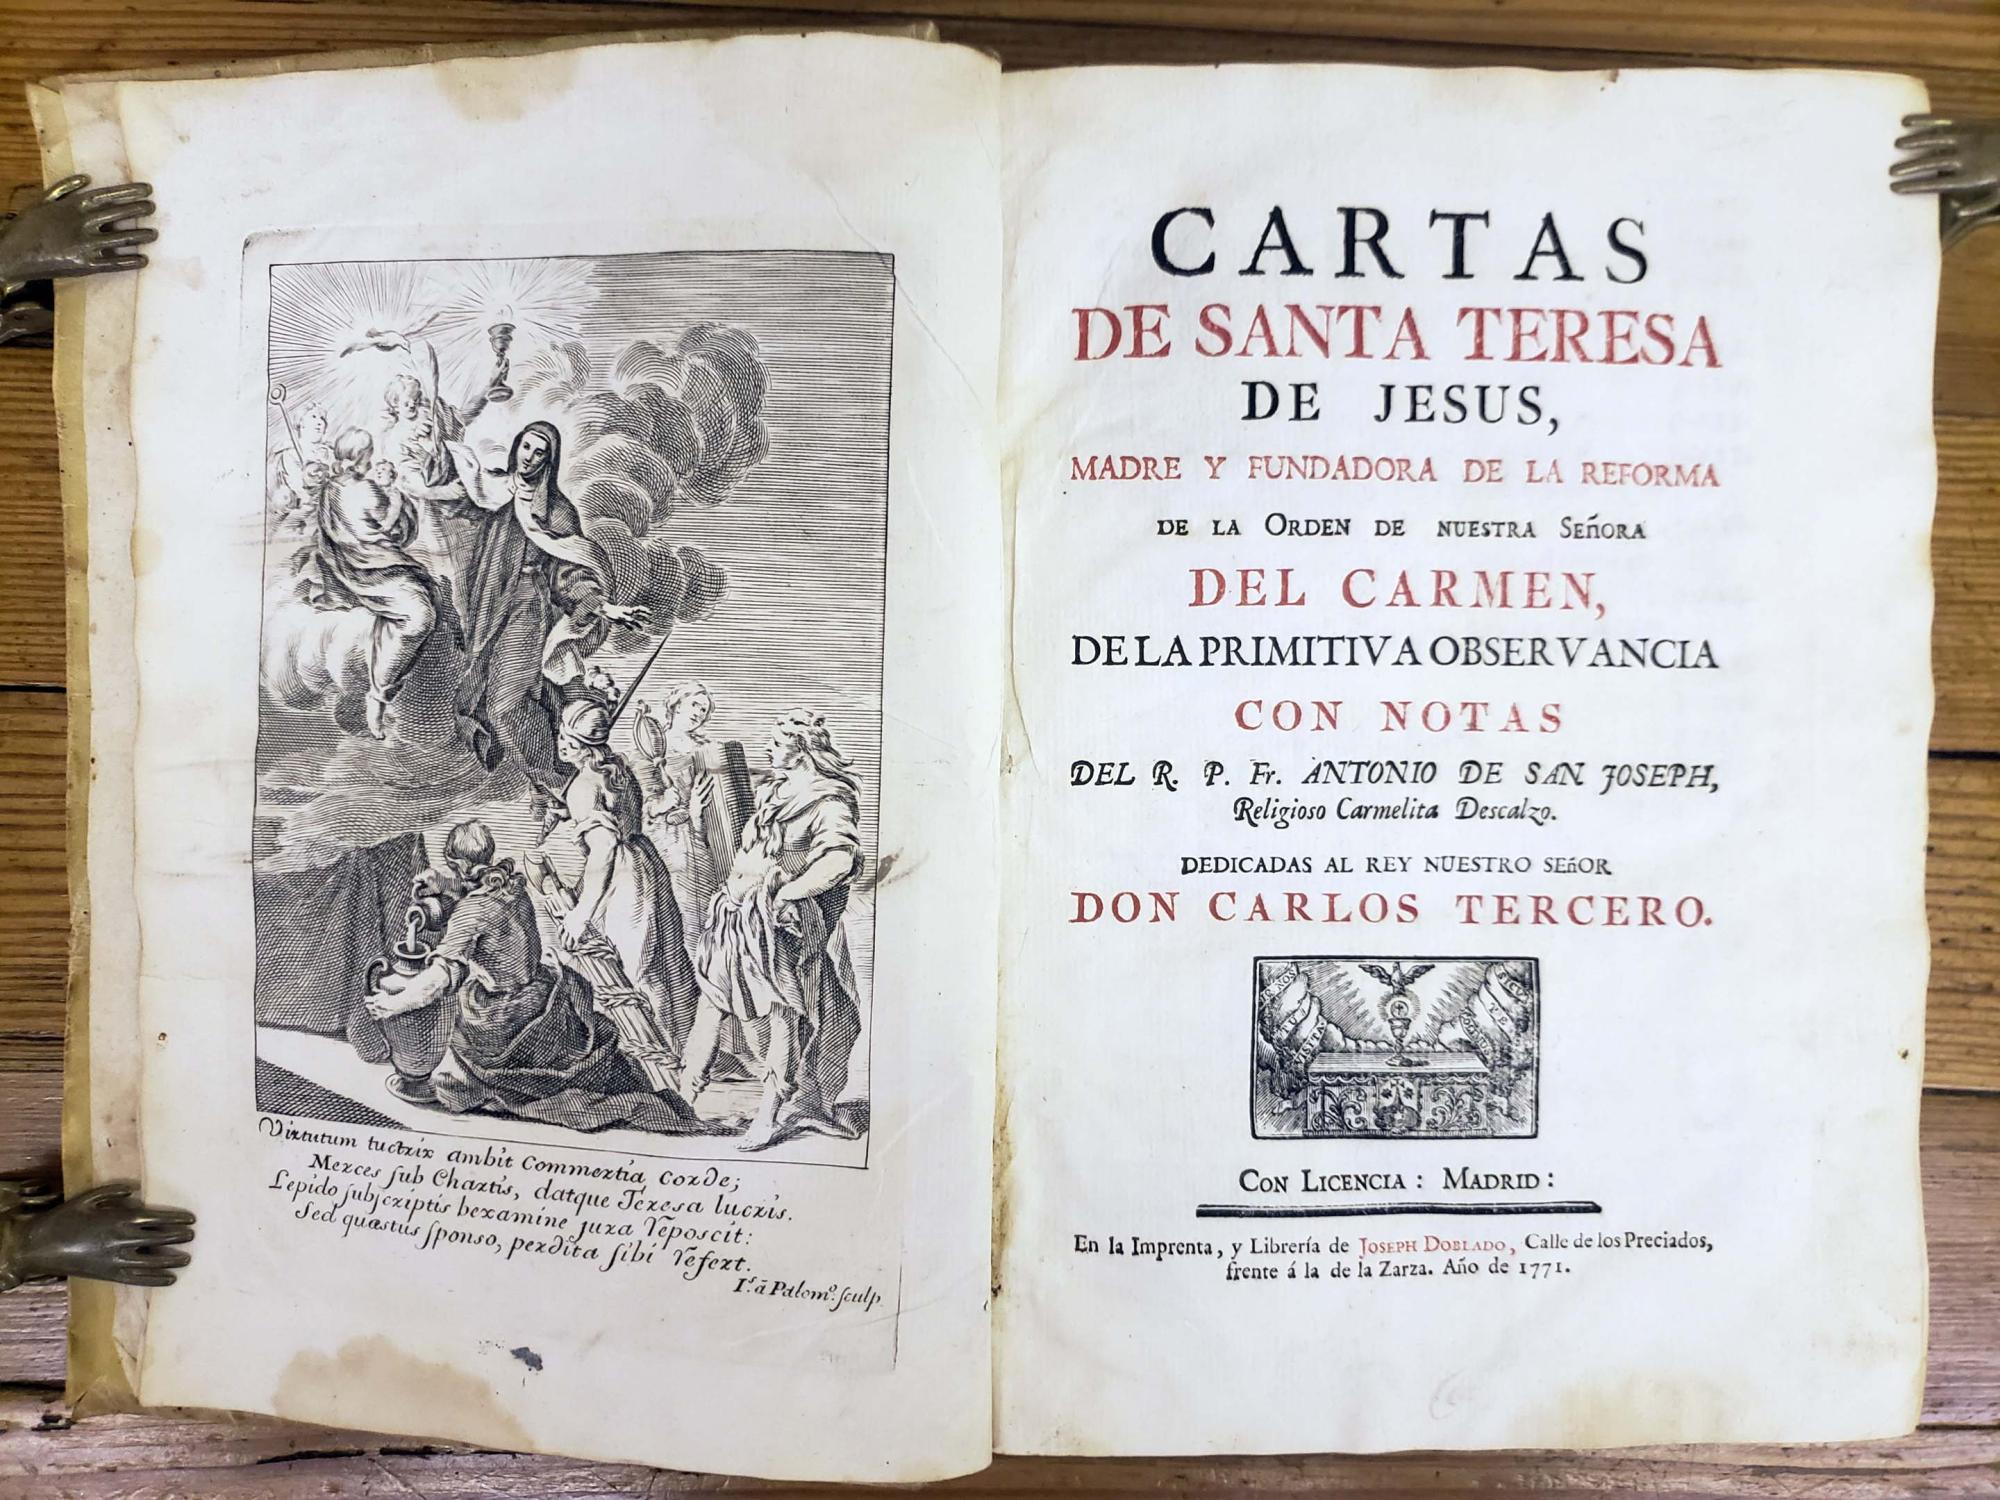 Cartas de Santa Teresa